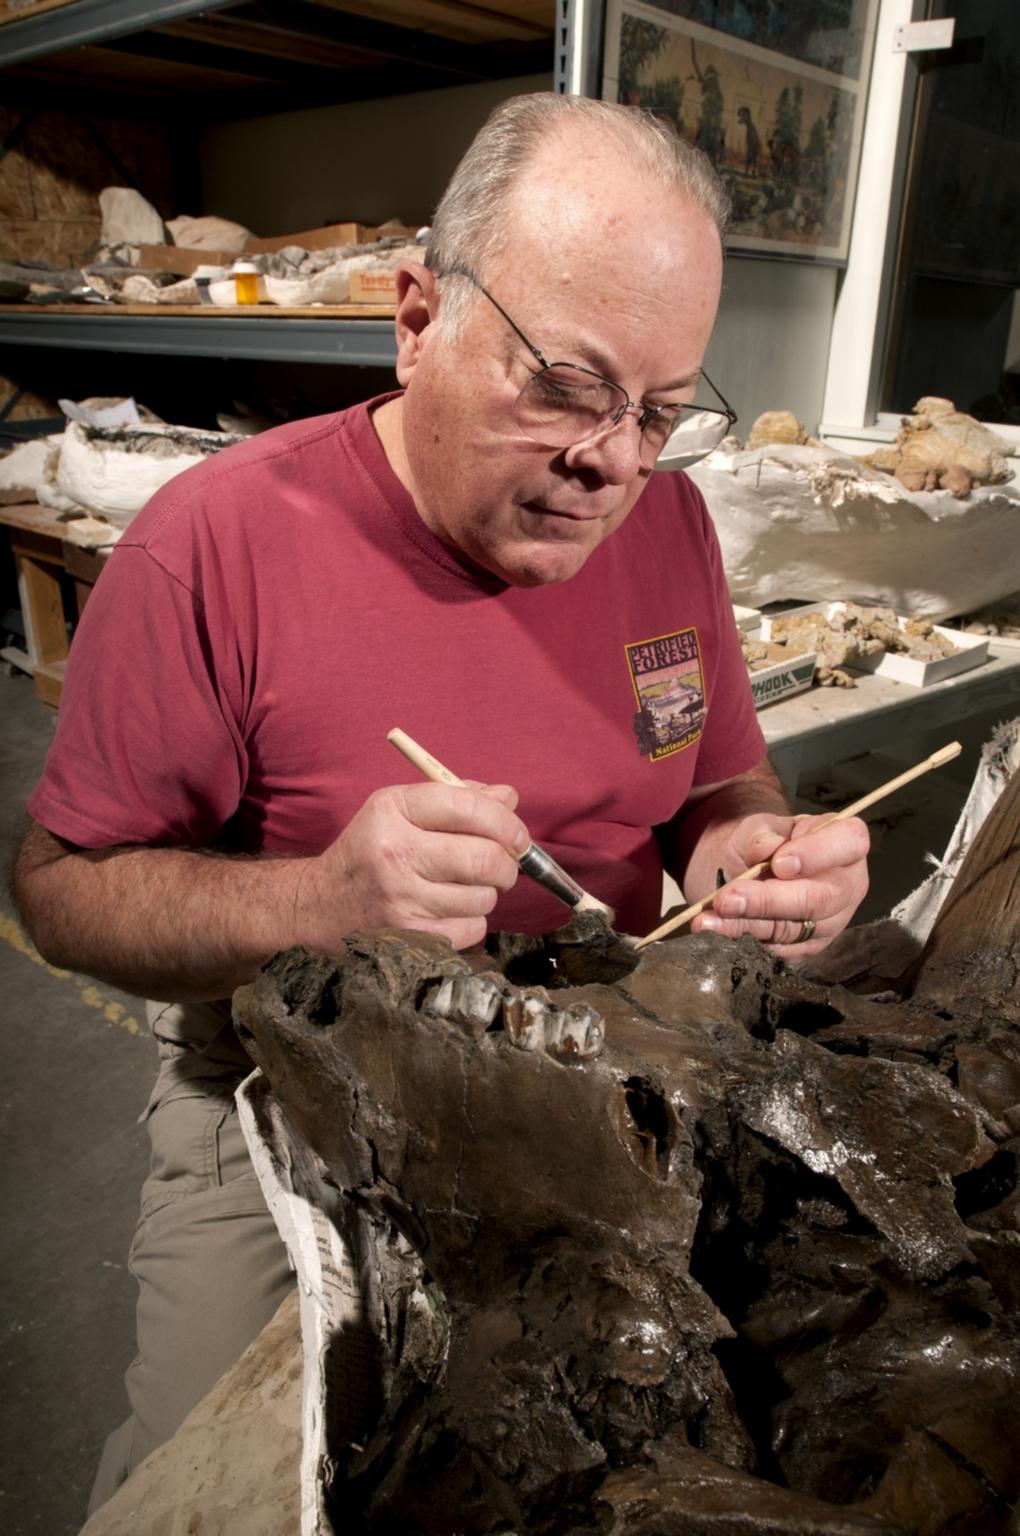 Working on a Bison Jaw from Snomastadon Excavation in Paleo Lab